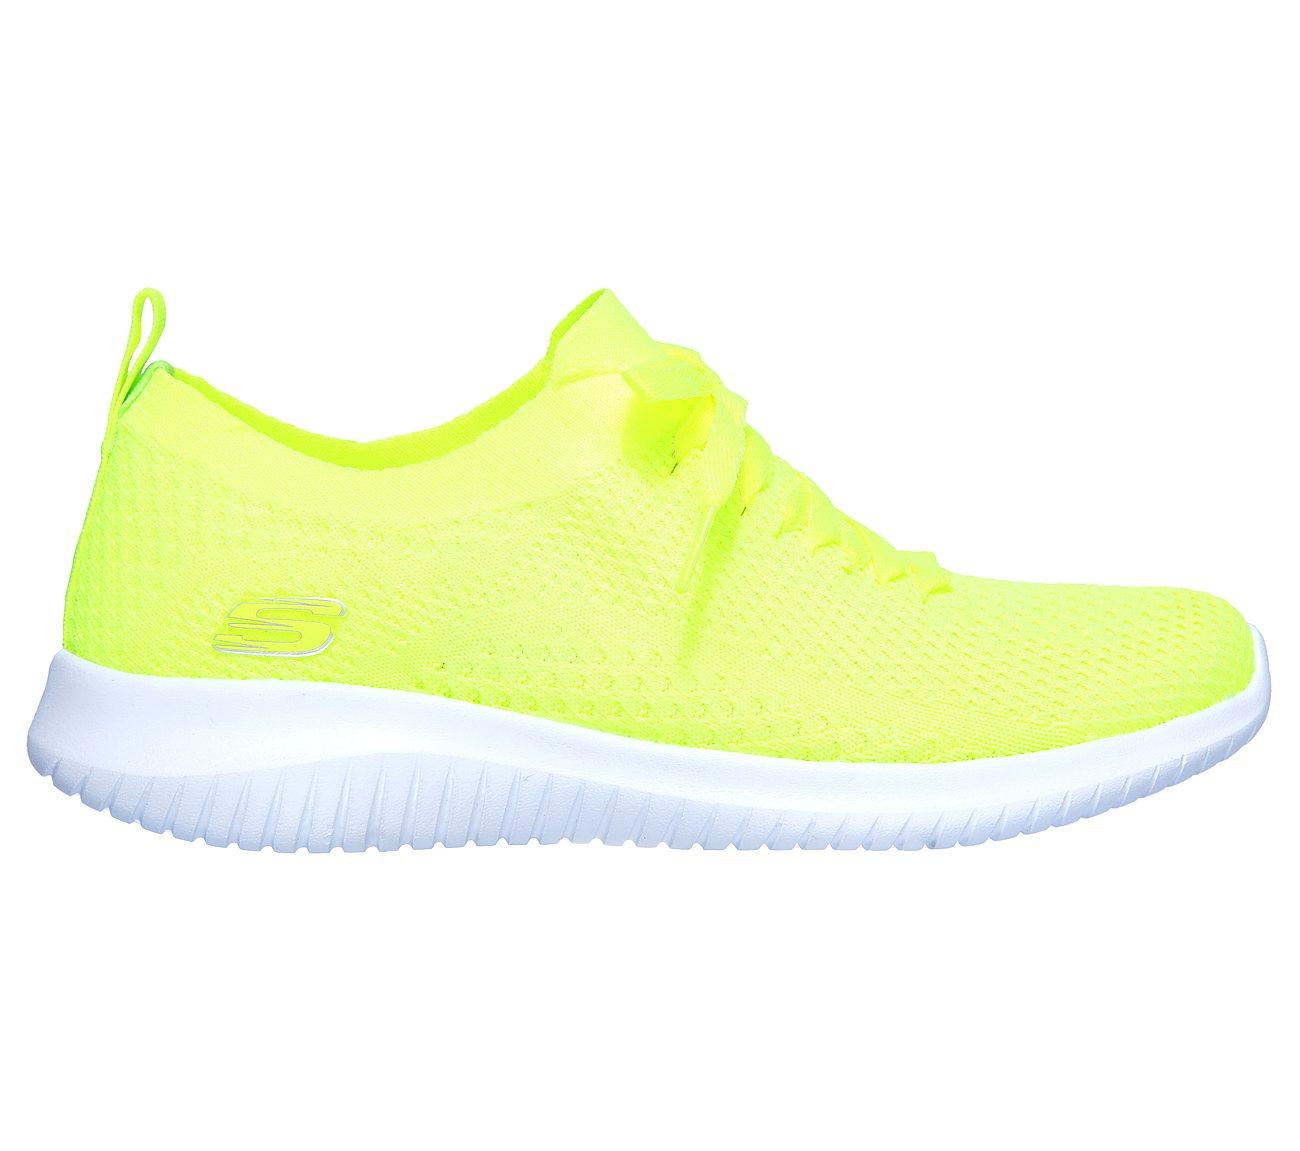 Buy SKECHERS Ultra Flex Sugar Bliss Sport Shoes 2qWMq